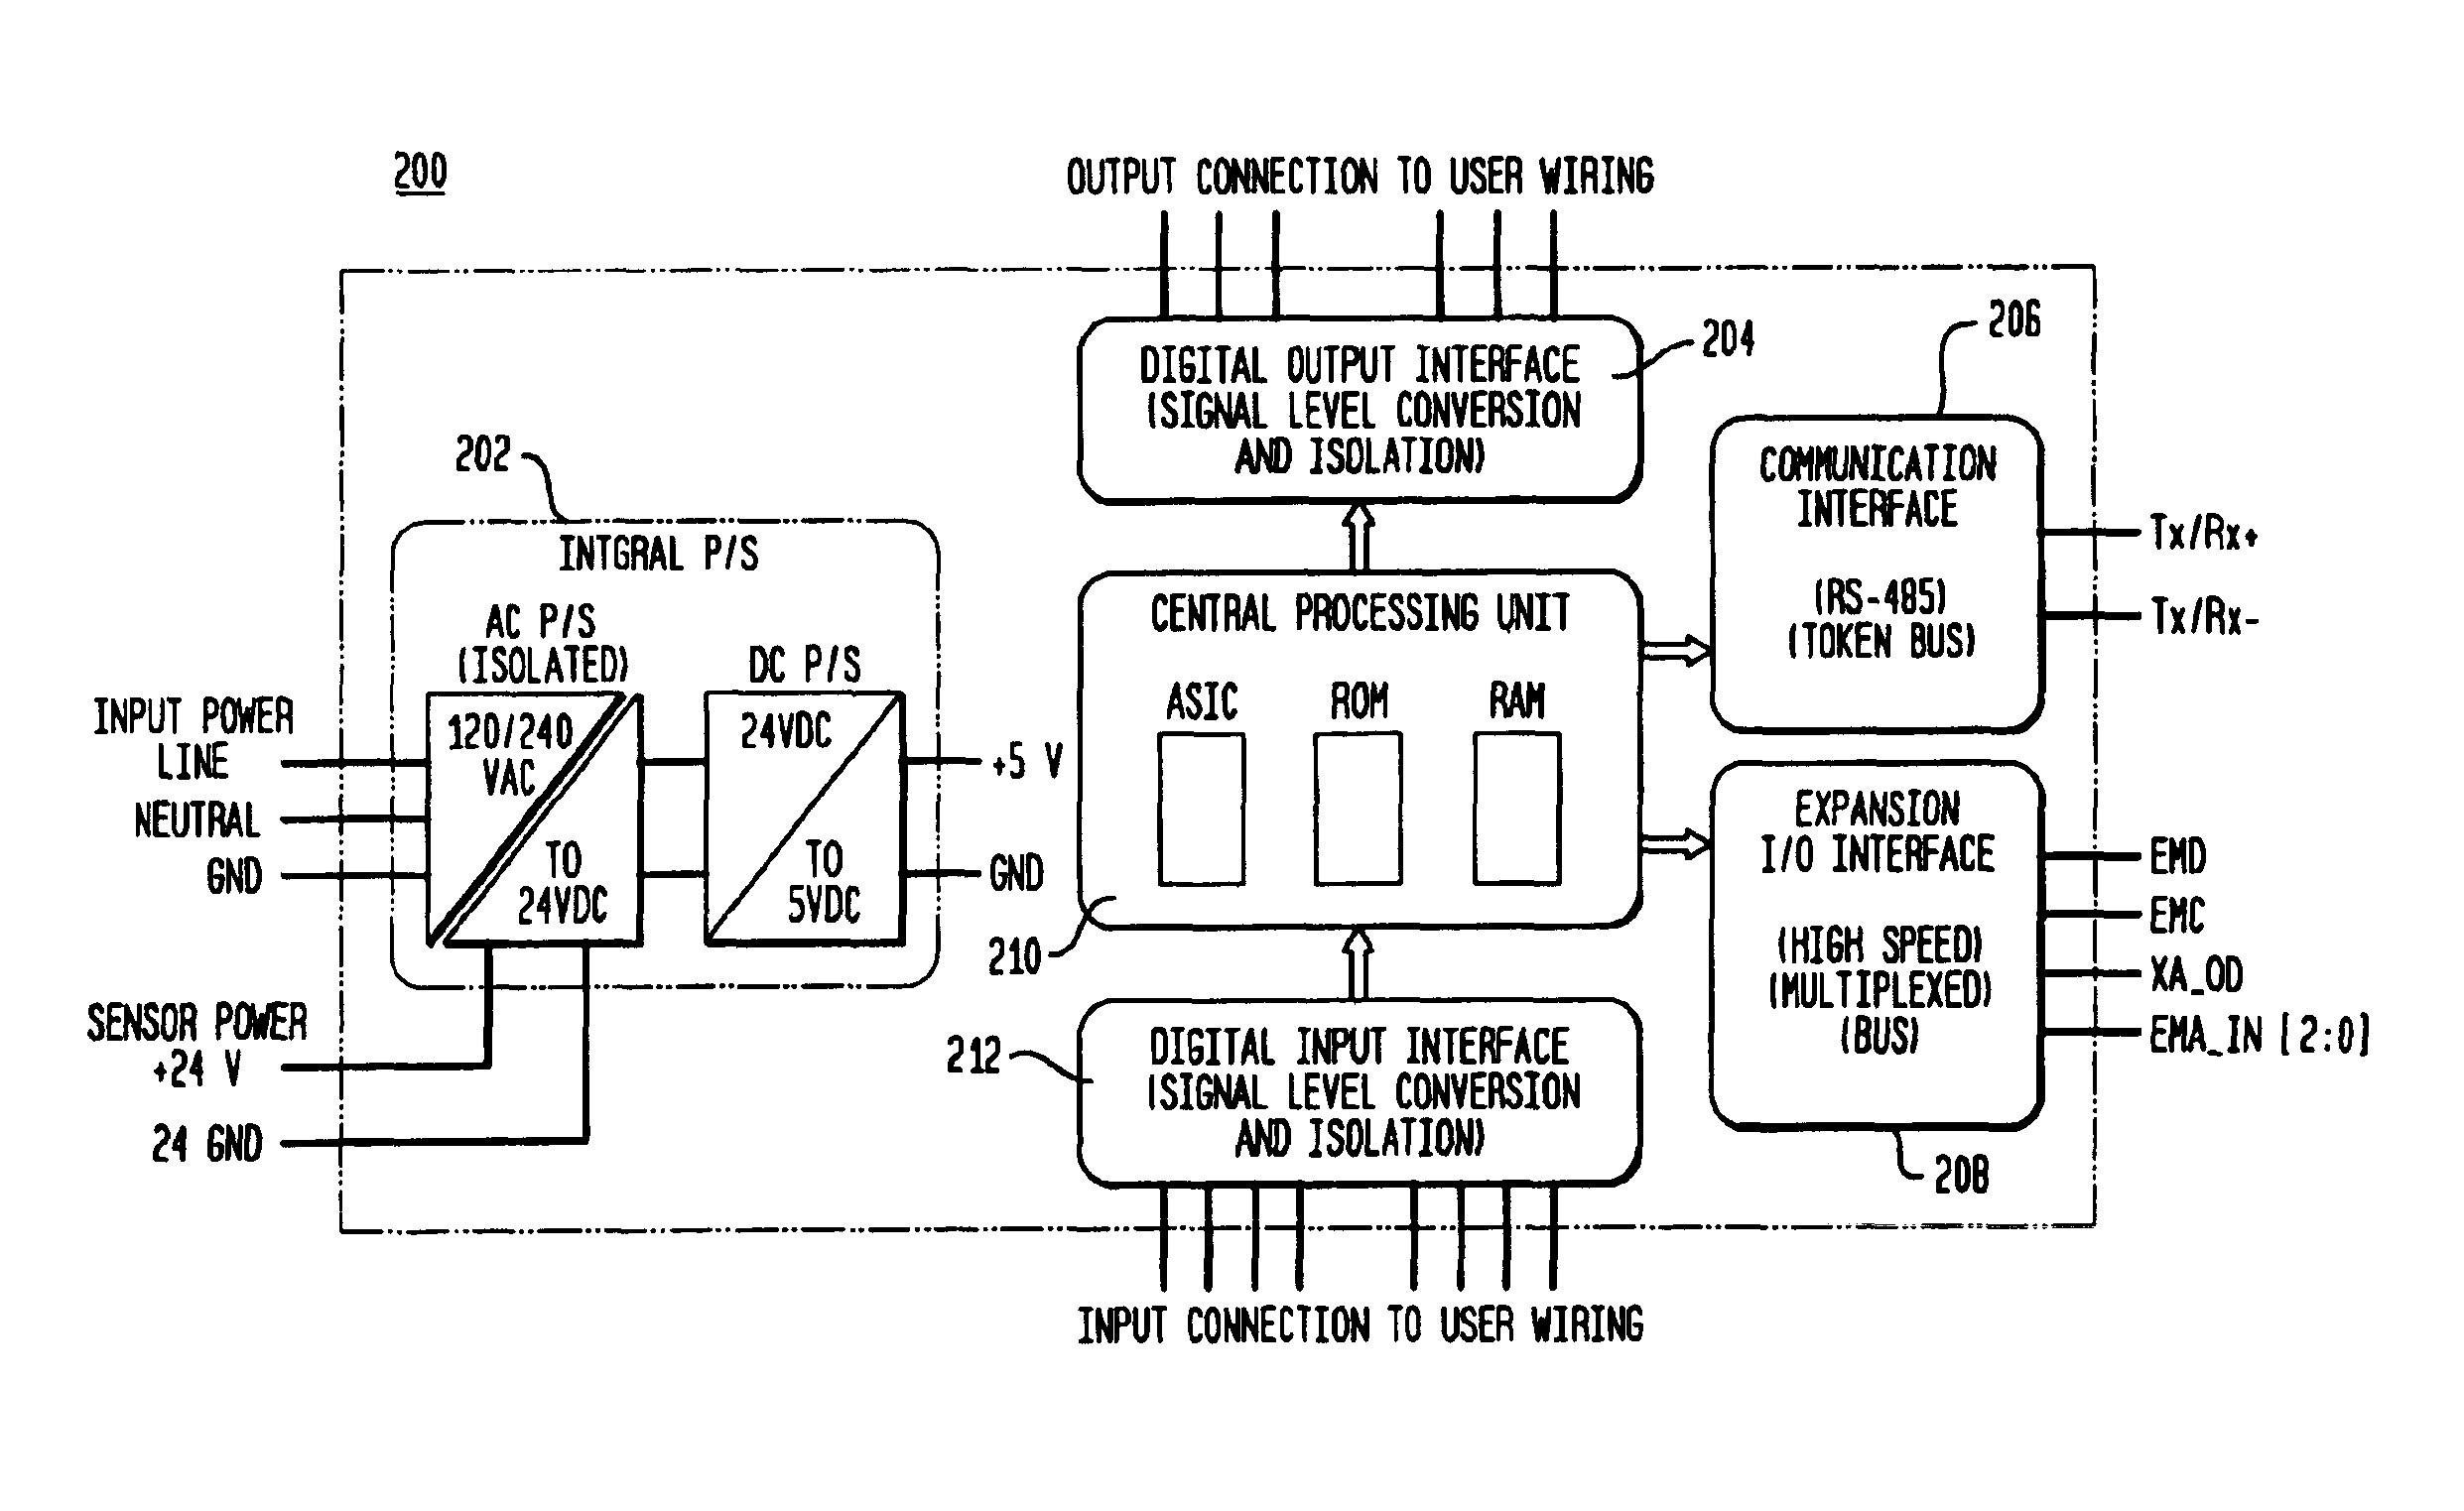 Briggs and Stratton 22 Hp Engine Diagram Engine Wiring Diagram Wire Data Schema • Of Briggs and Stratton 22 Hp Engine Diagram